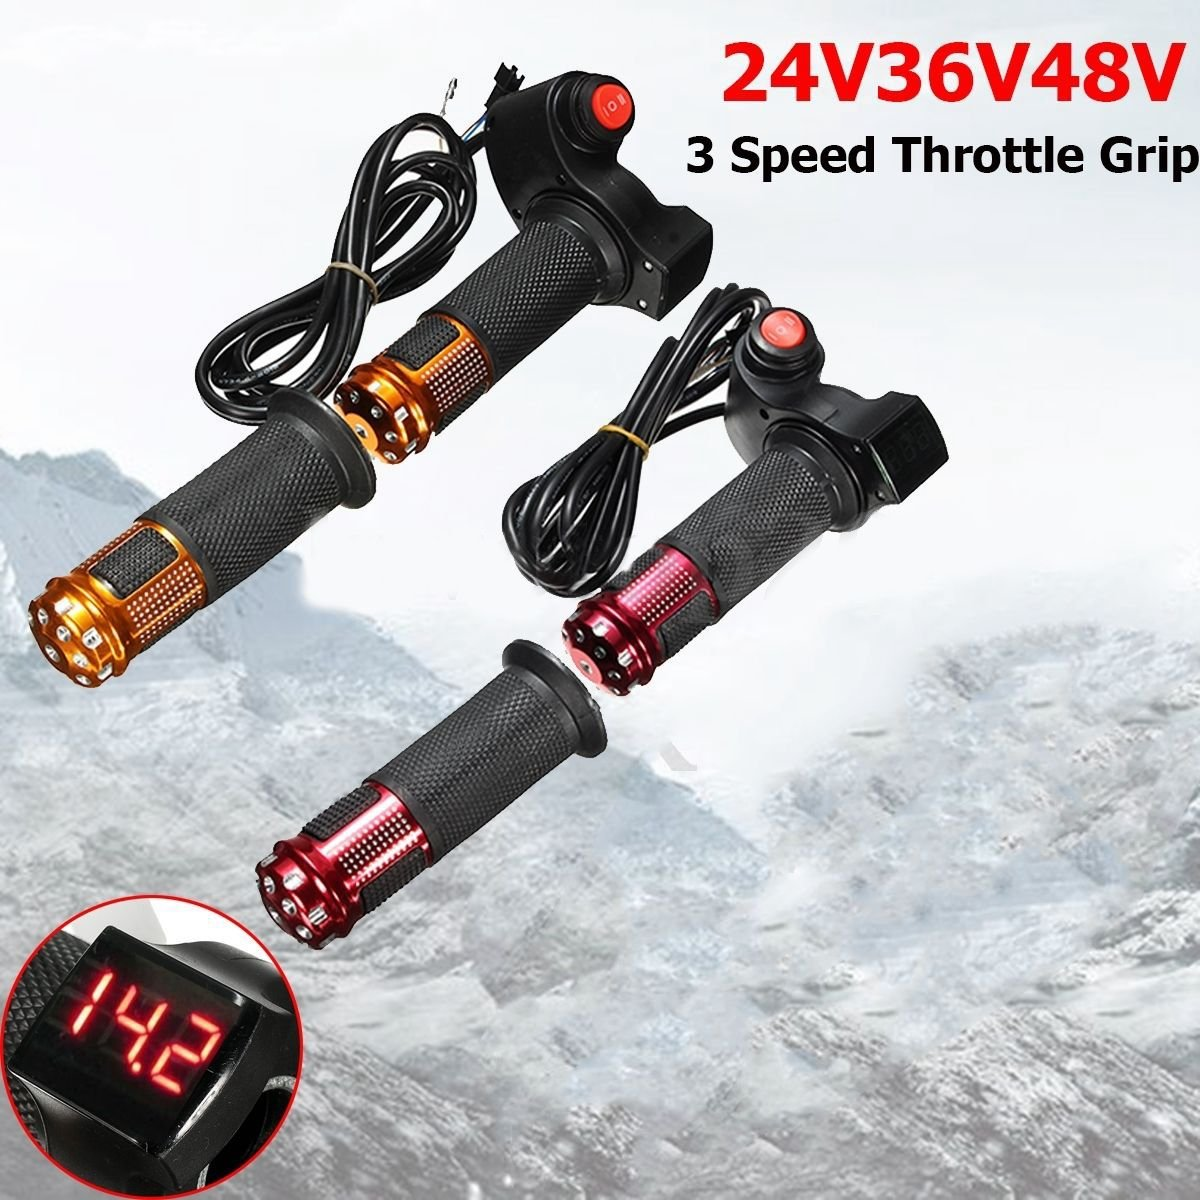 Or ACAMPTAR 24V 36V 48V 3 Vitesses Scooter Electrique Guidon de poignee des gaz Compteur numerique LED